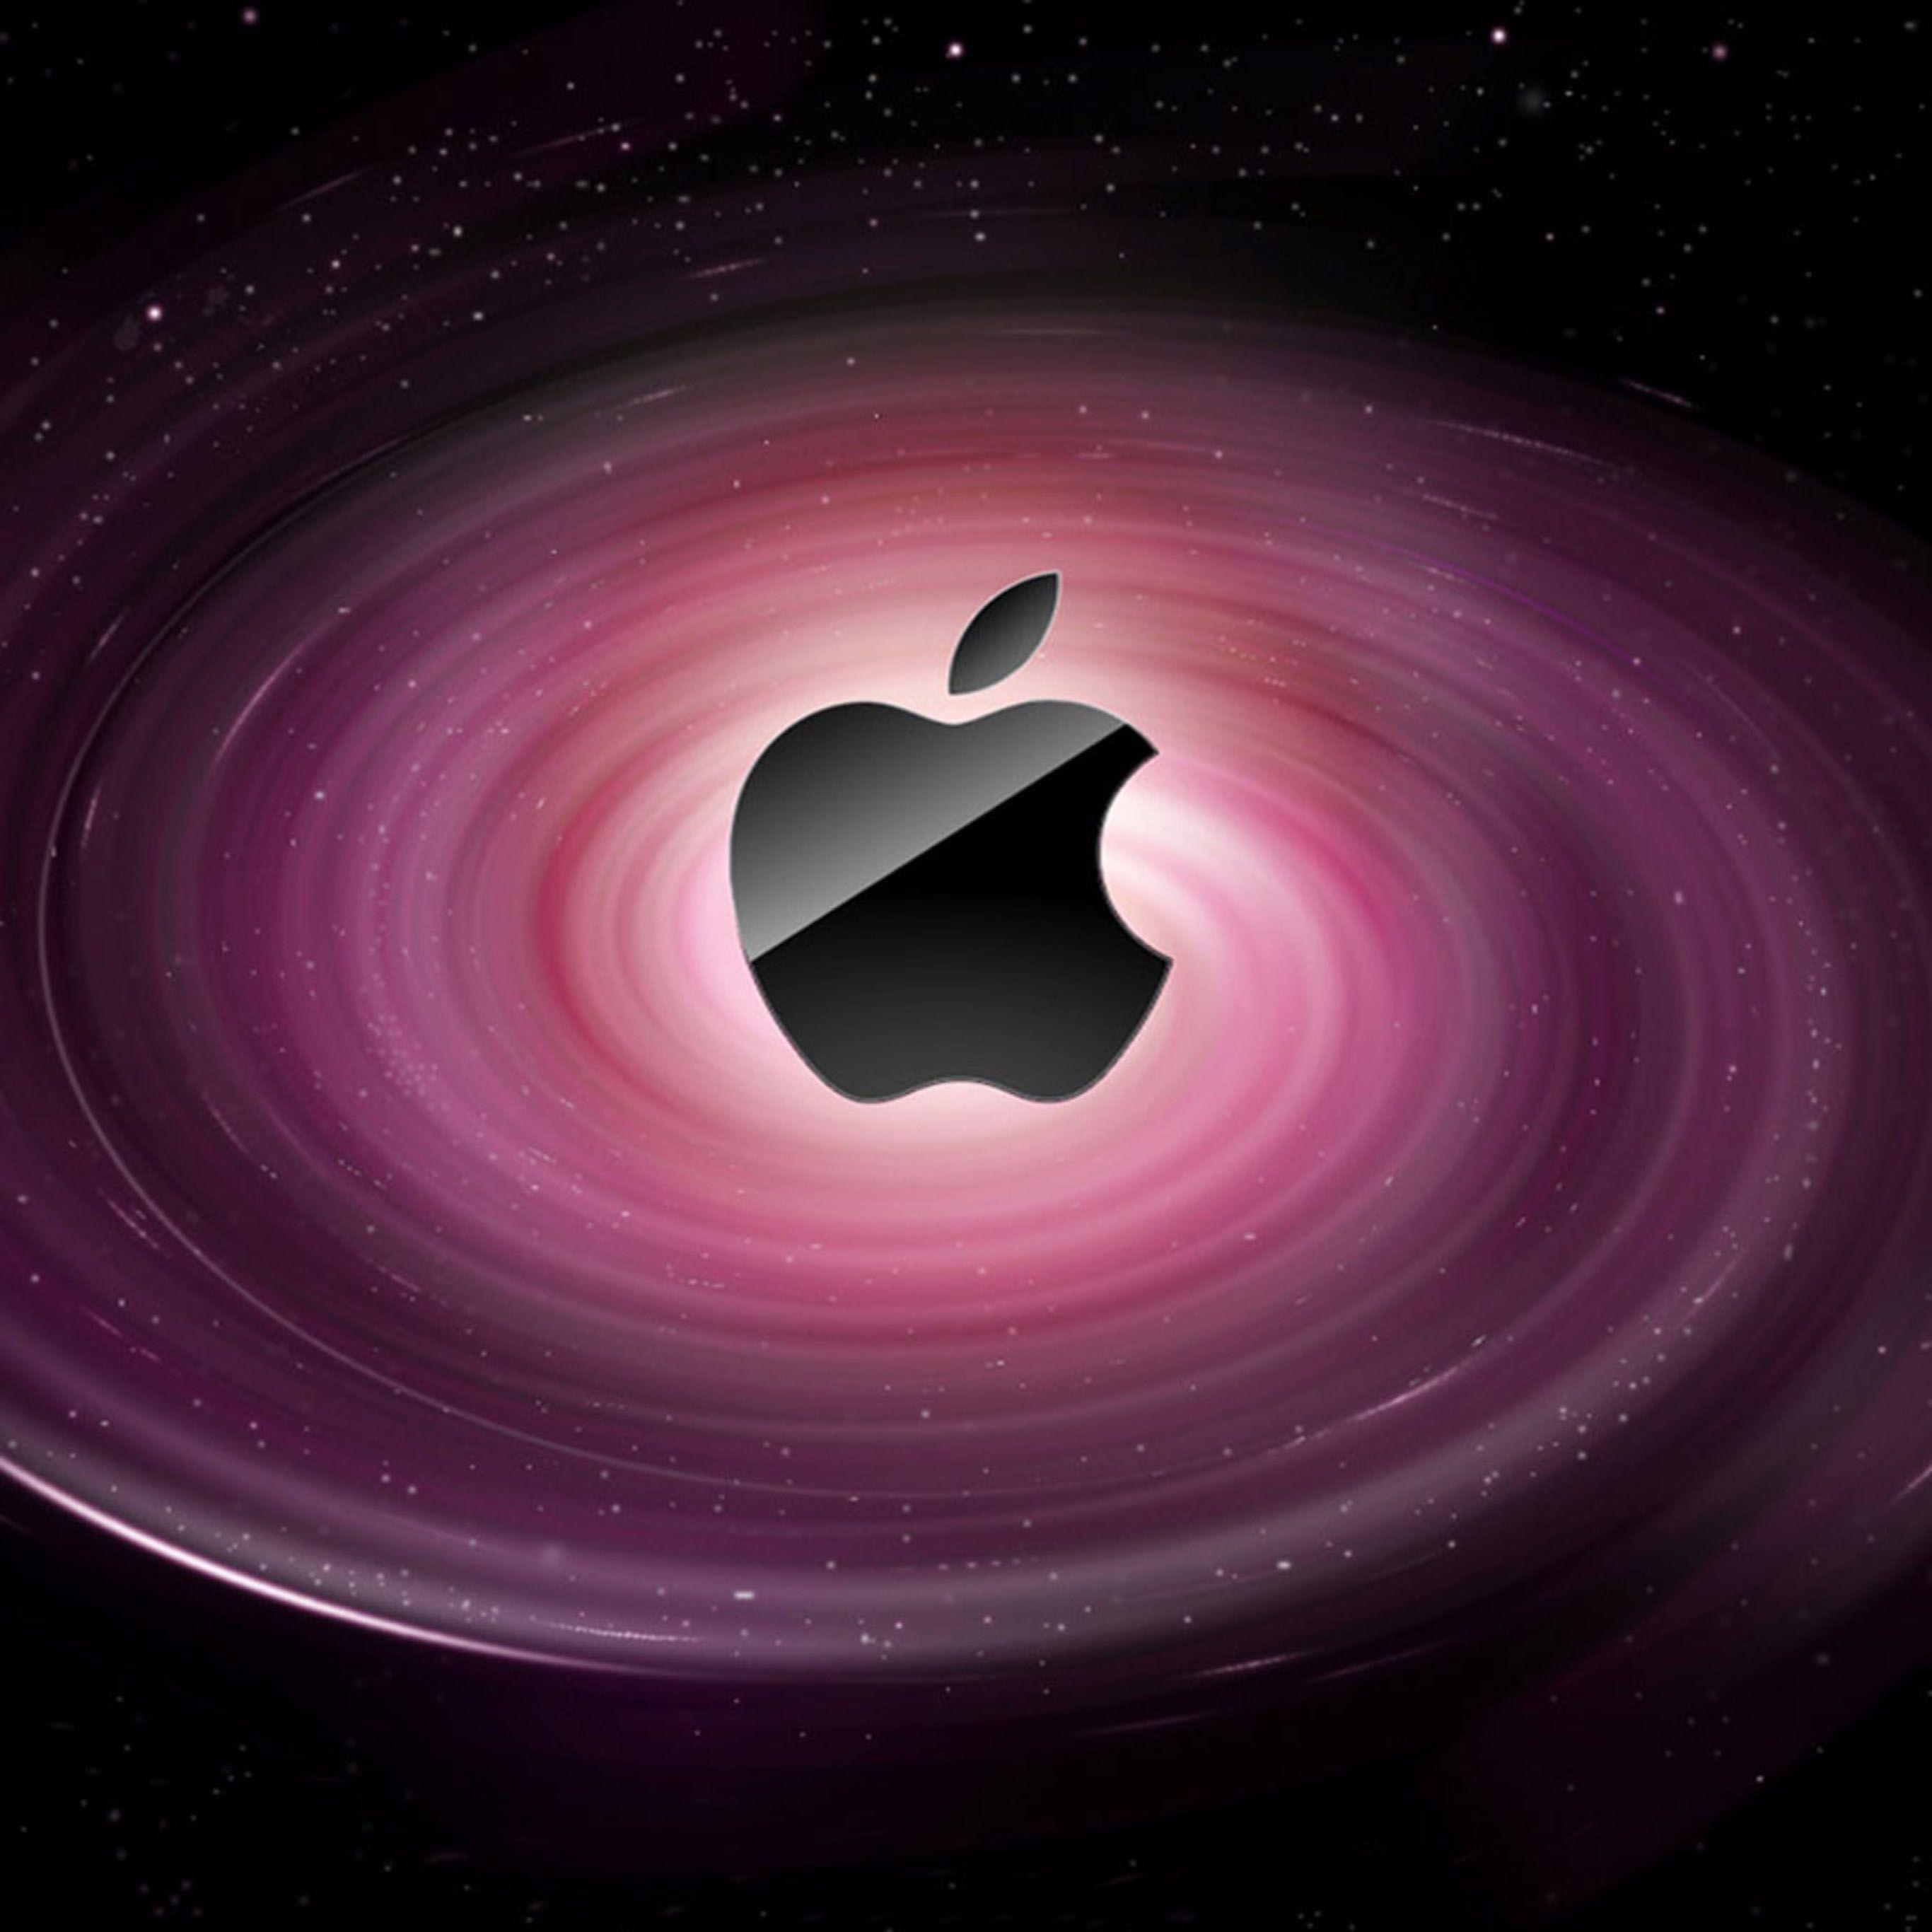 Apple Ipad Pro Wallpaper 162 Apple Ipad Wallpaper Apple